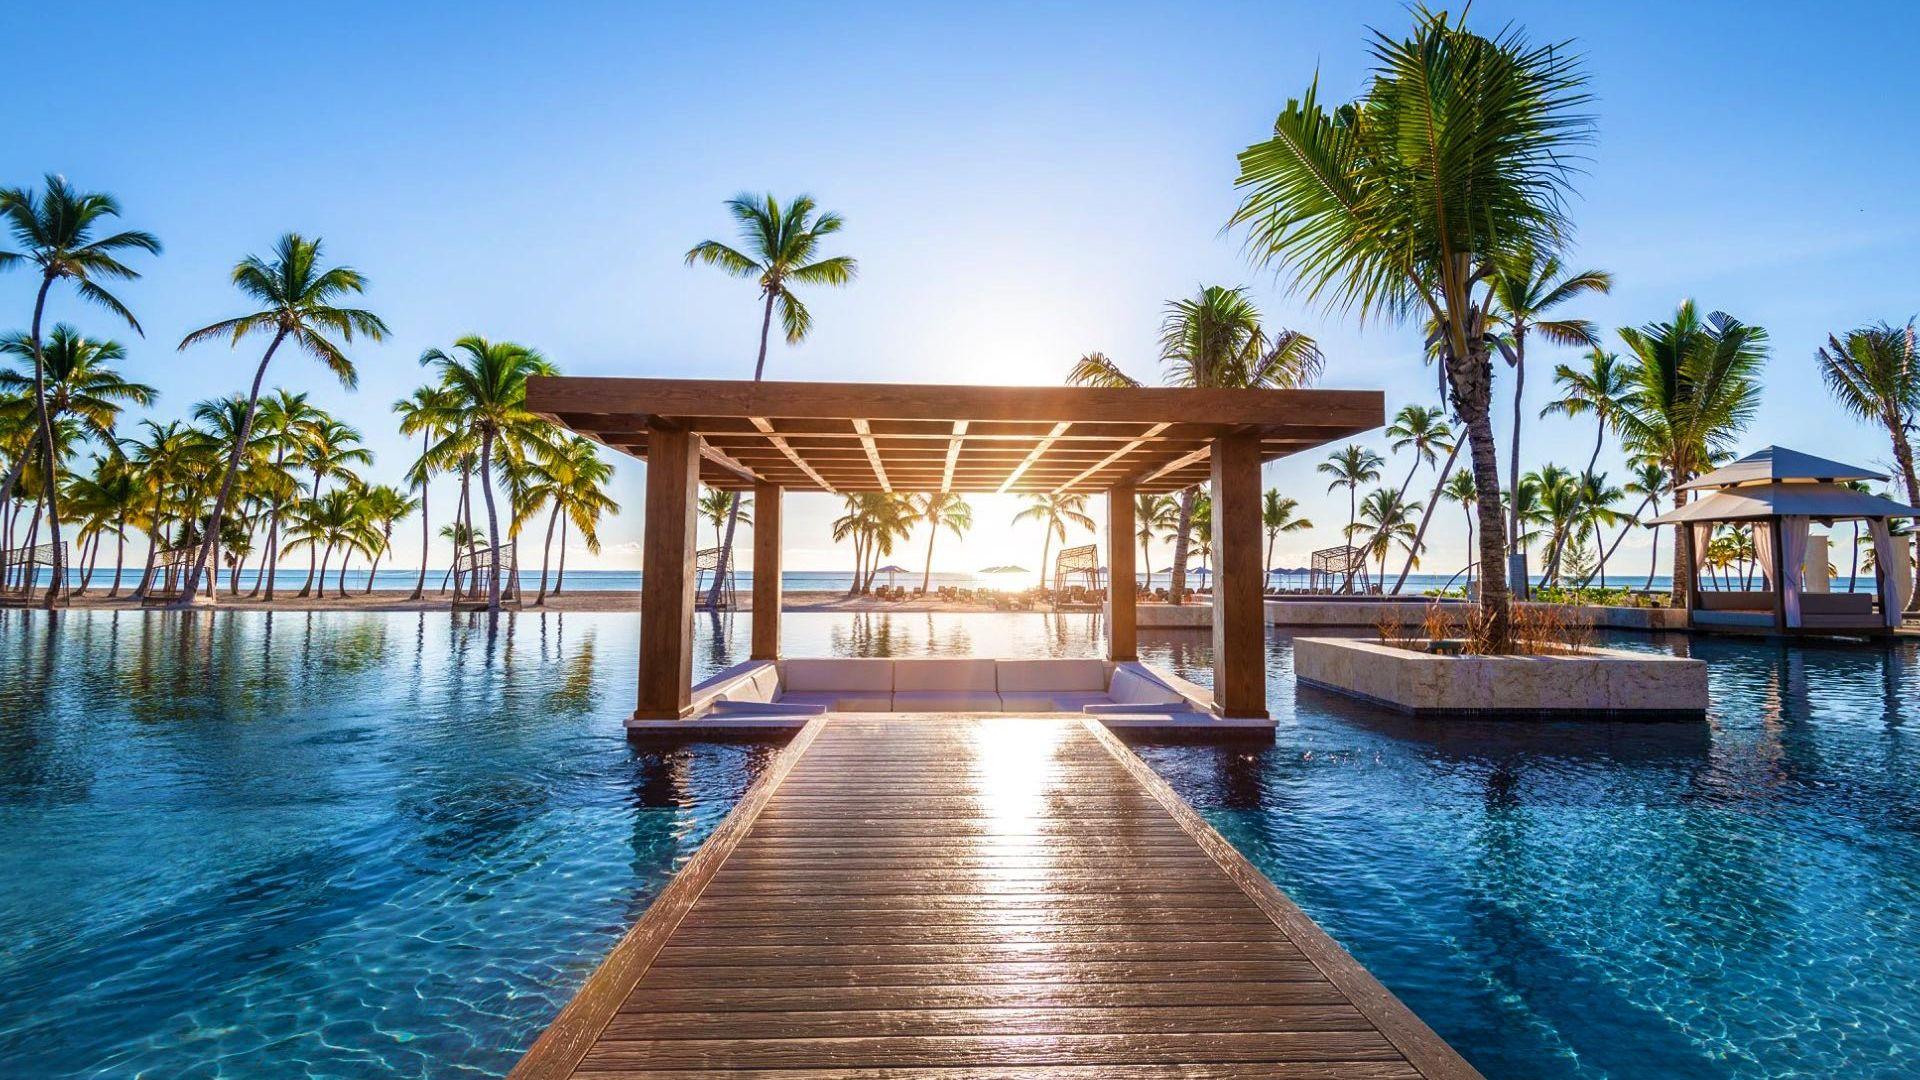 Sejur charter Hyatt Resort Punta Cana, 9 zile - ianuarie 2022